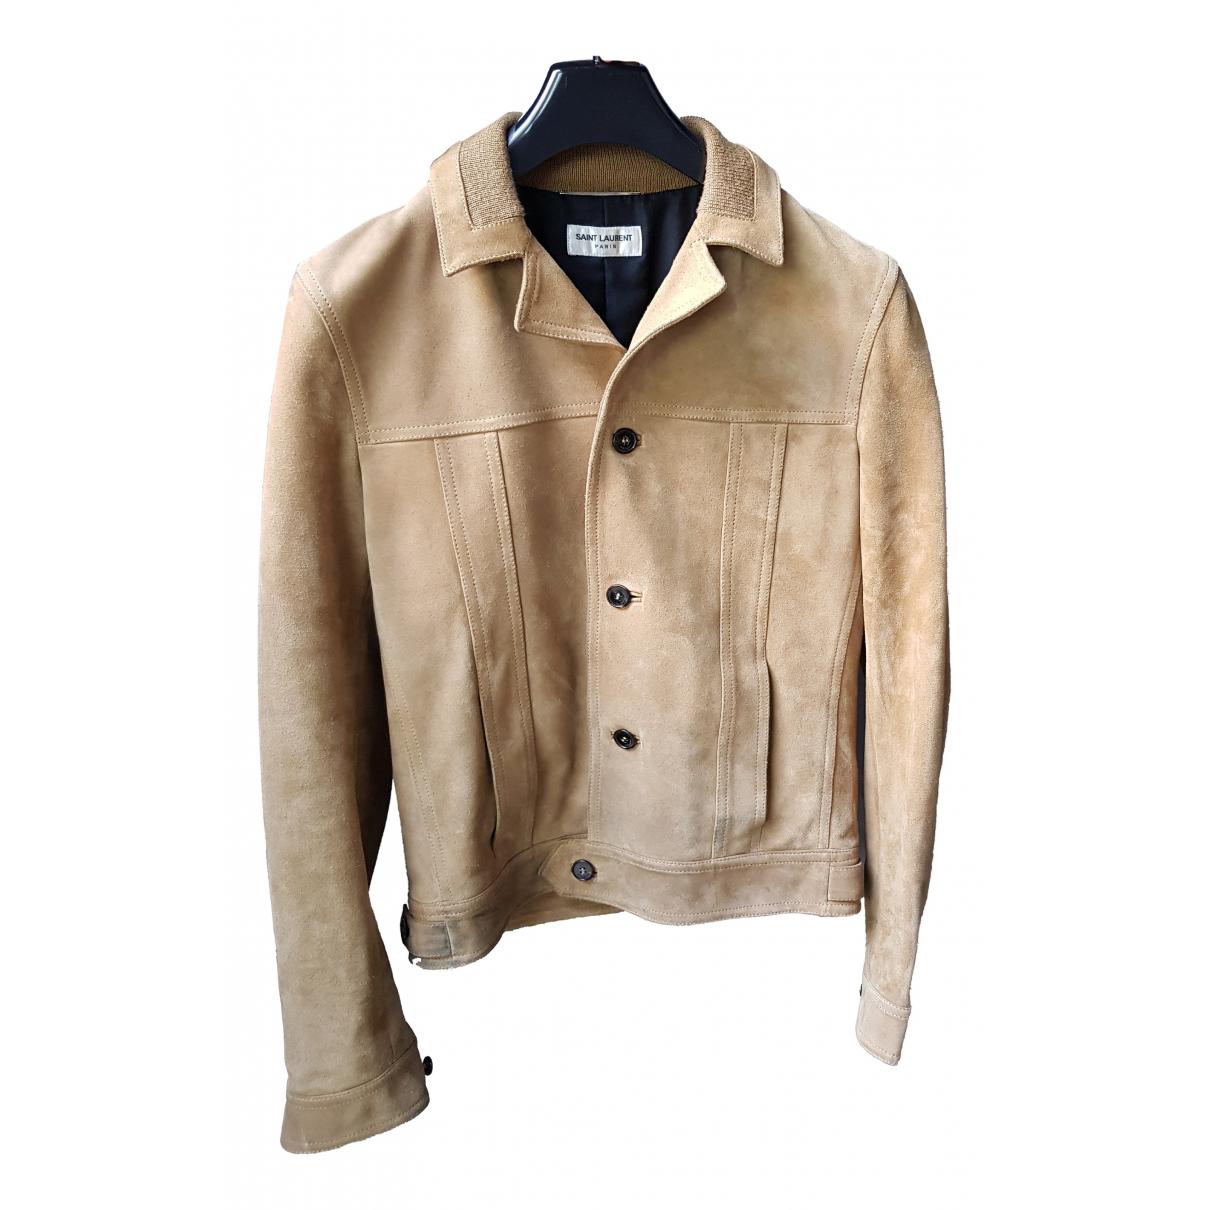 Yves Saint Laurent N Camel Suede jacket  for Men 44 IT